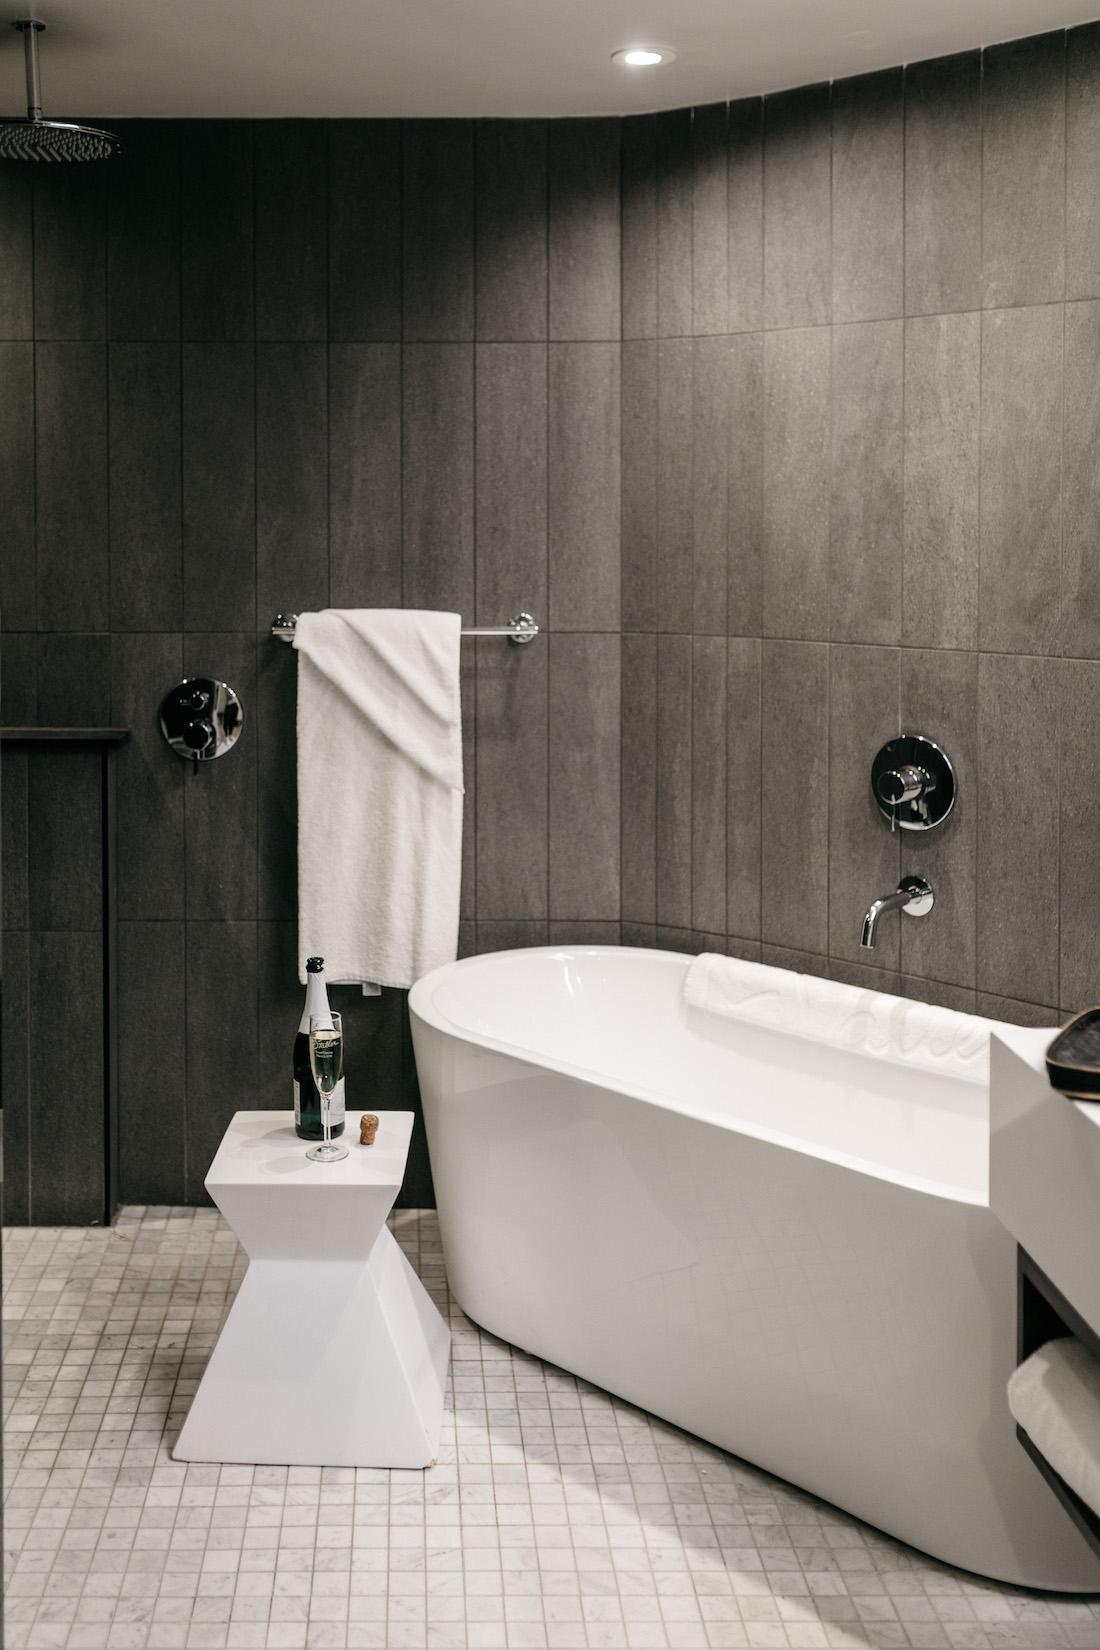 statler bathtub